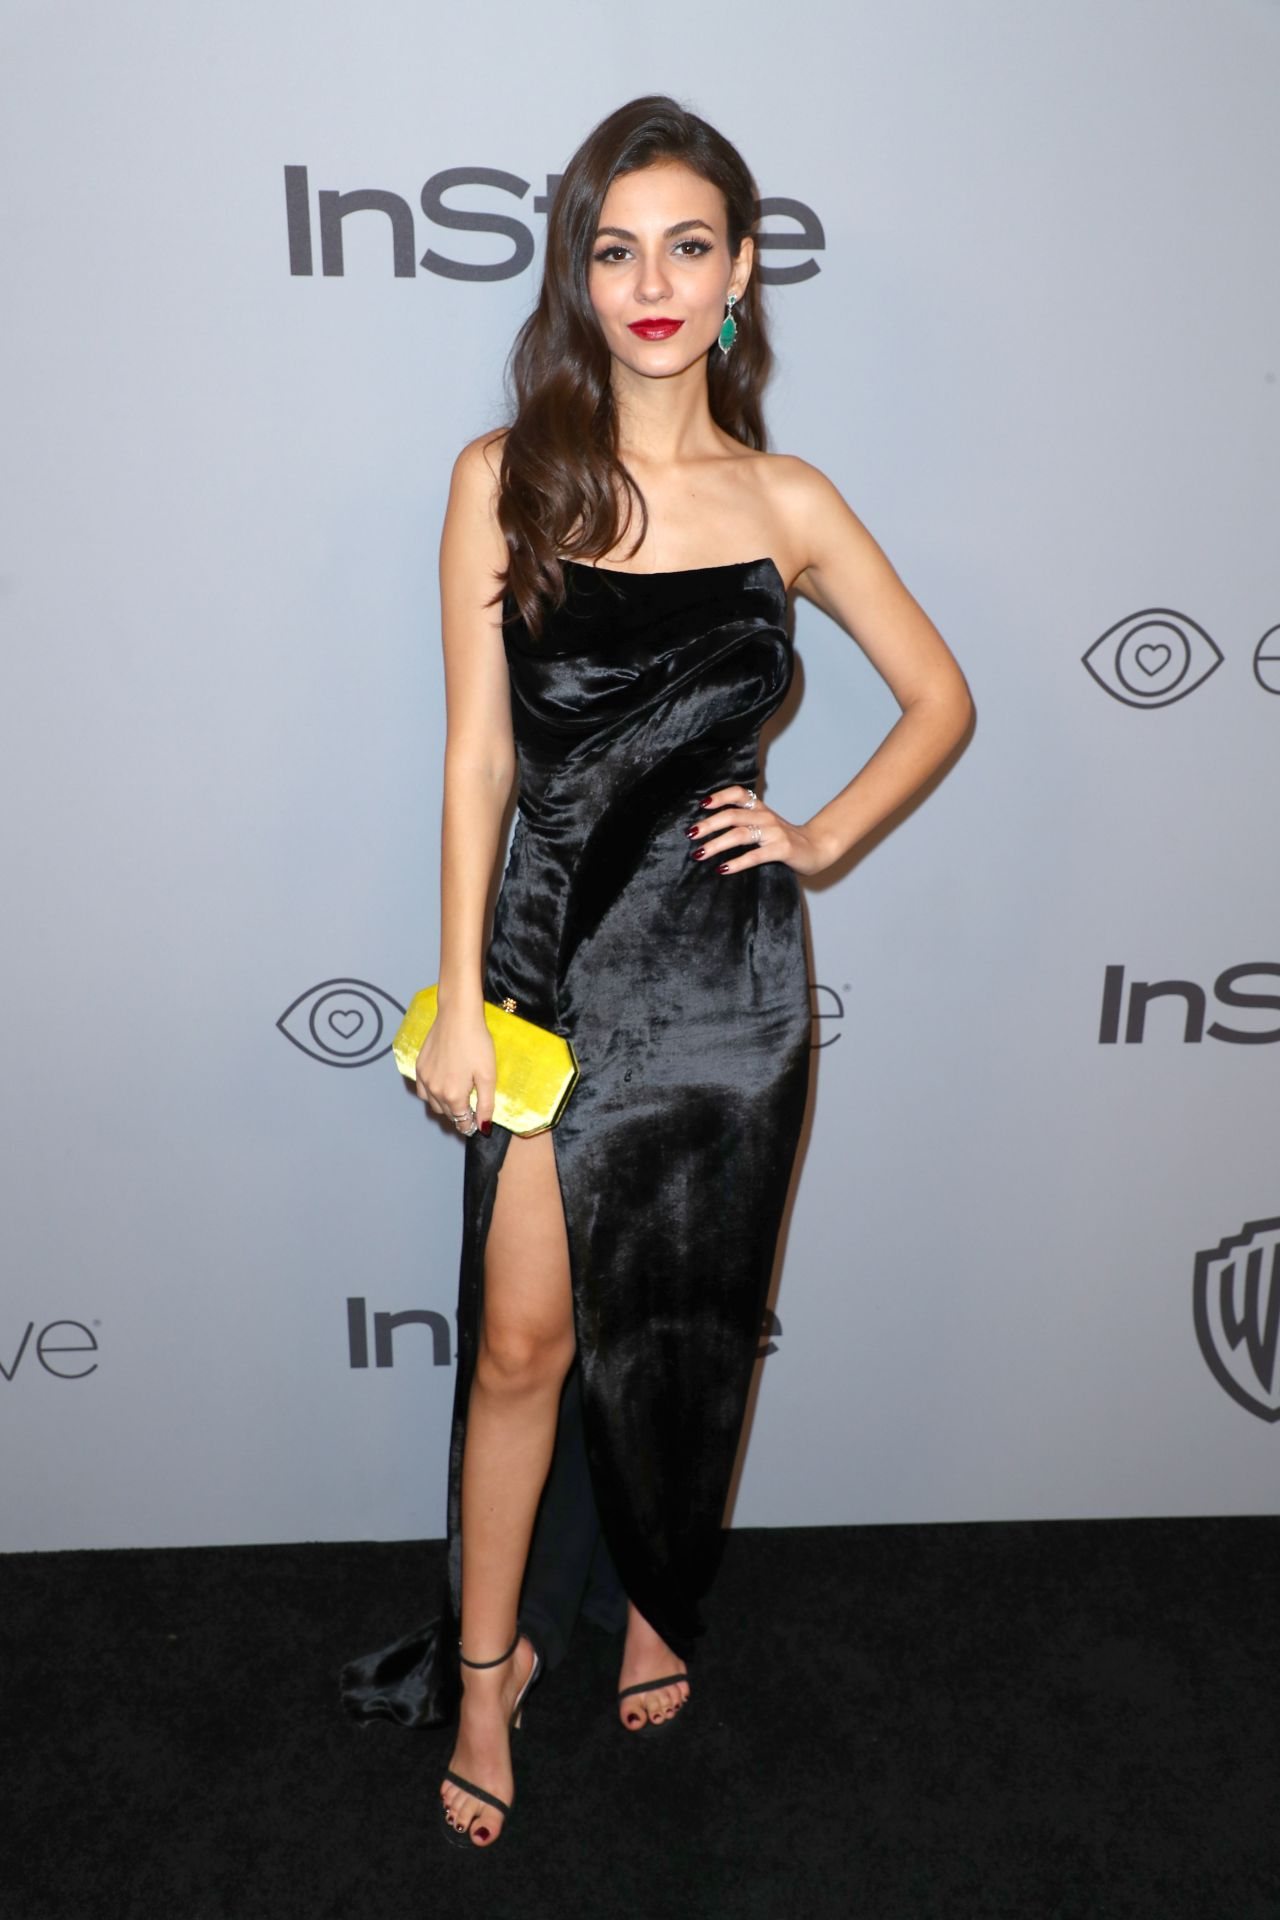 Victoria Justice Instyle And Warner Bros Golden Globes